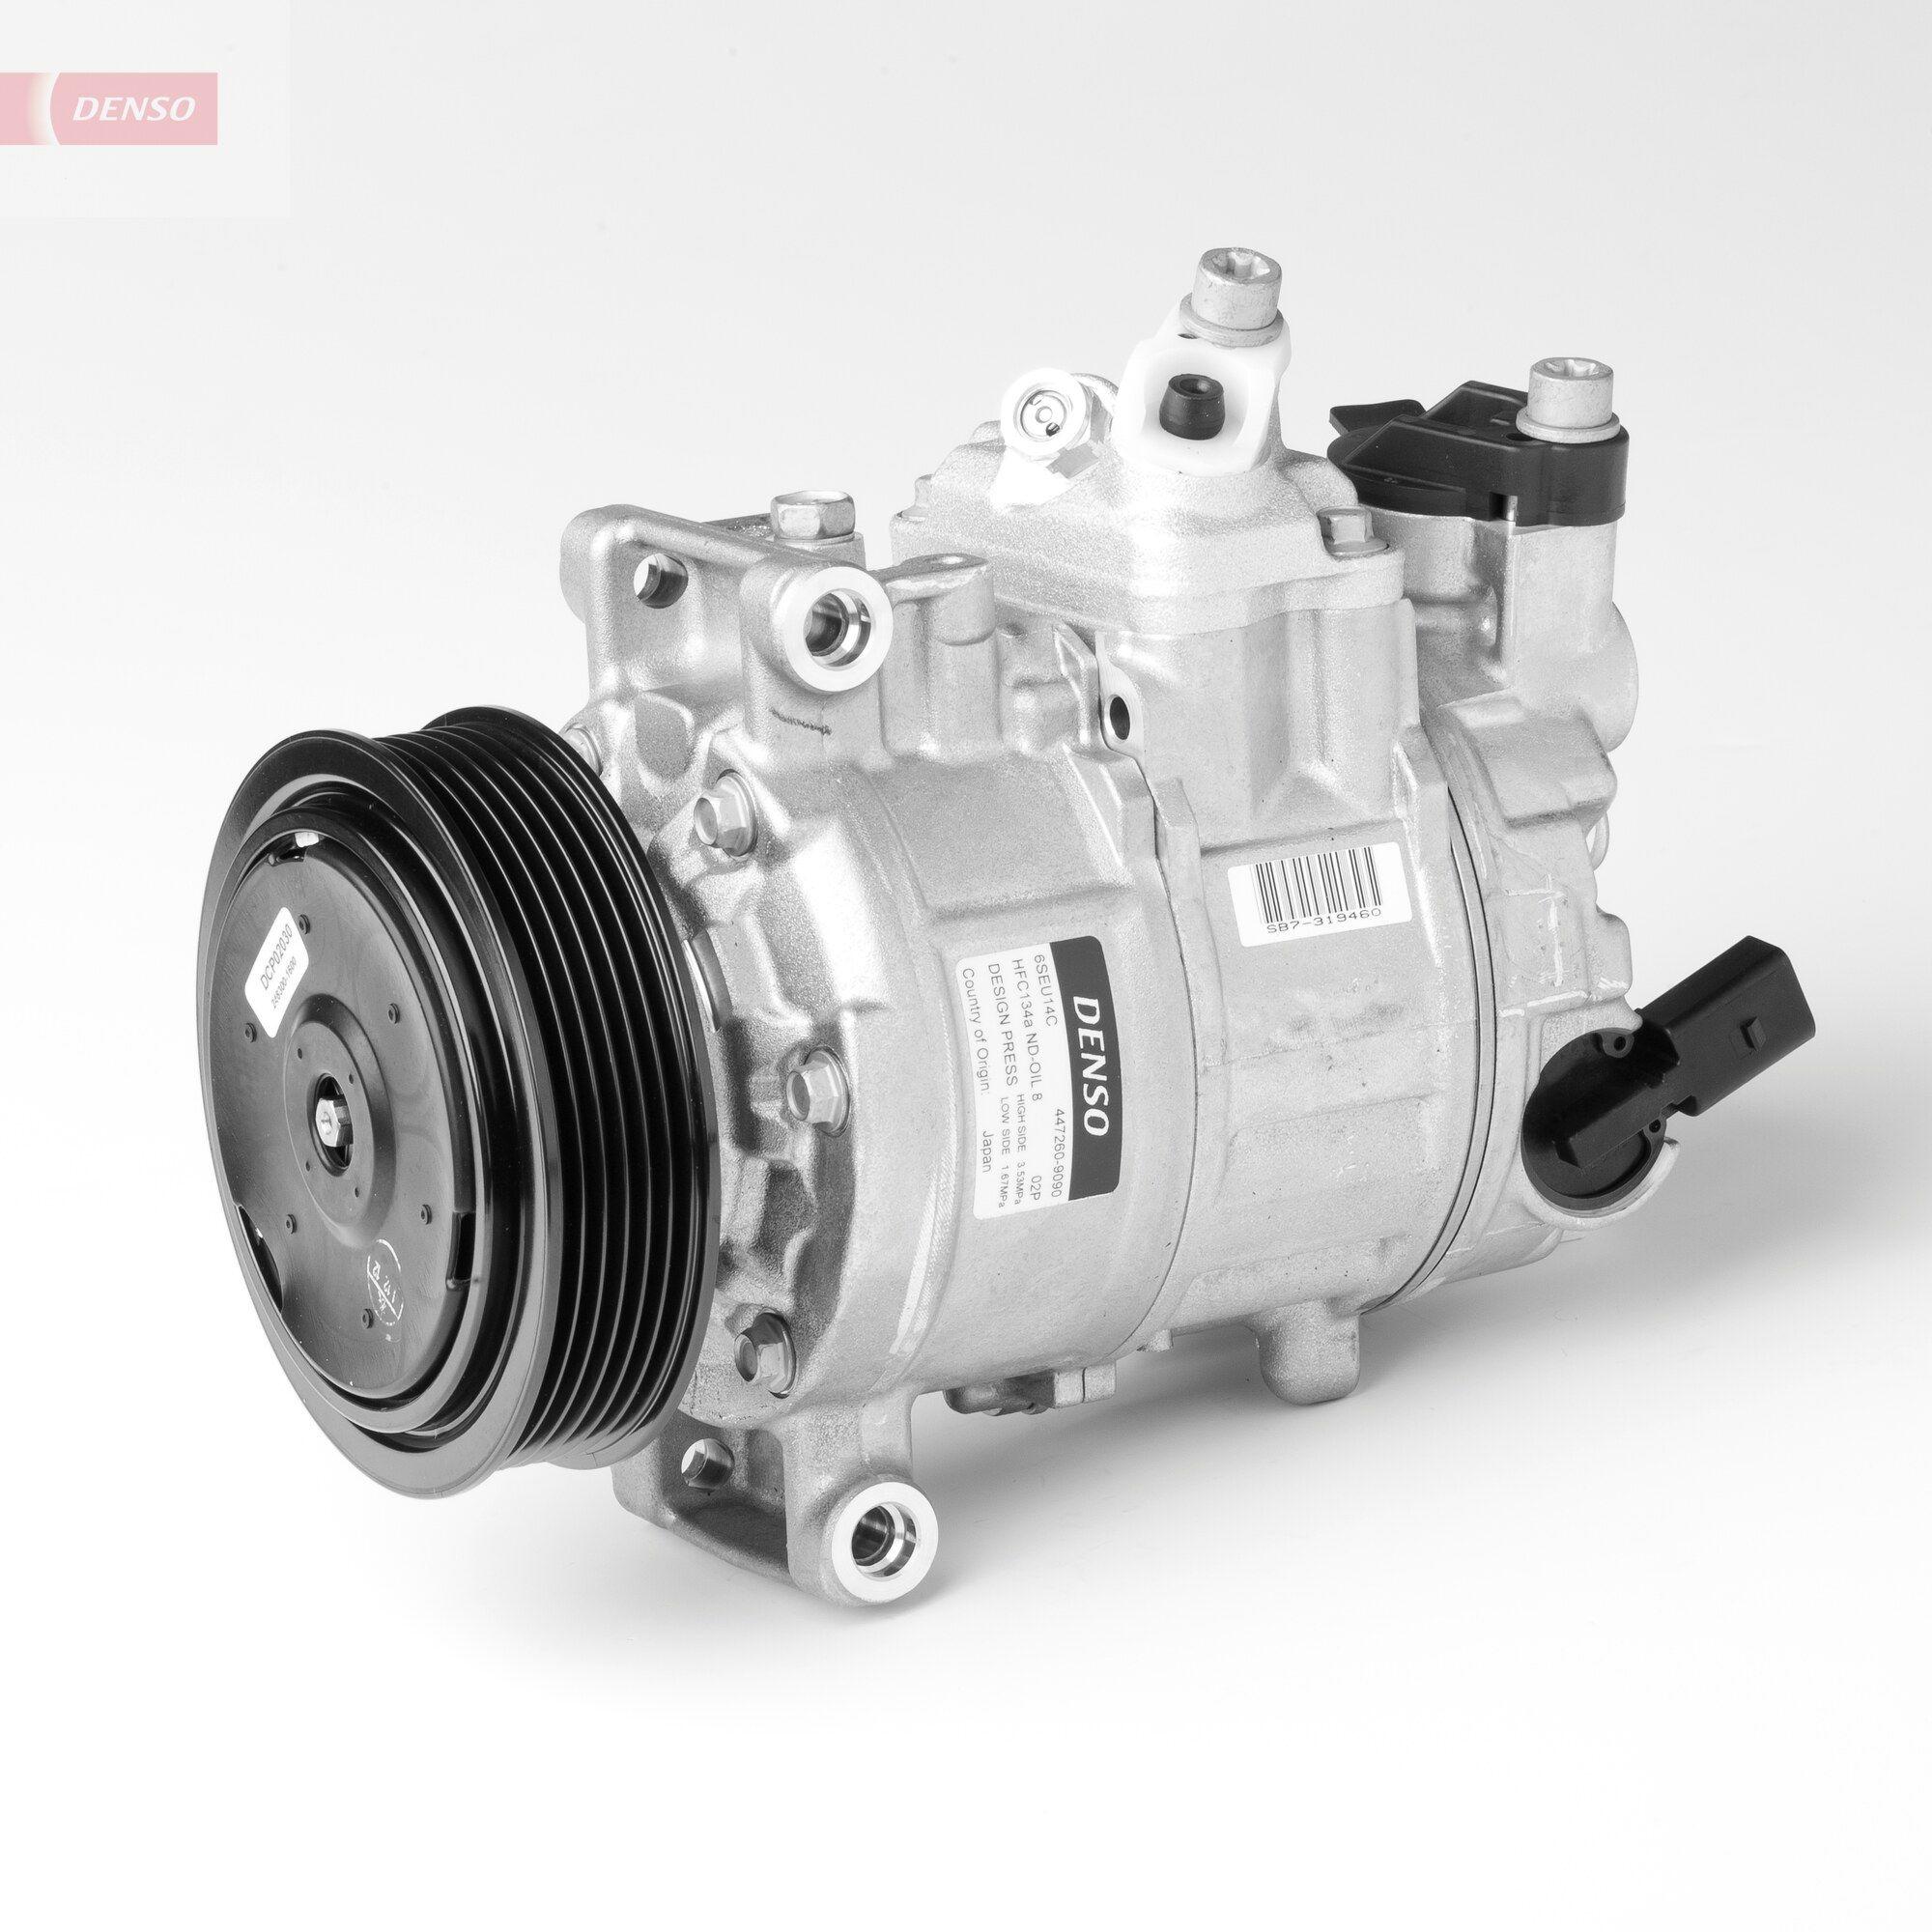 Original VW Klimakompressor DCP02030